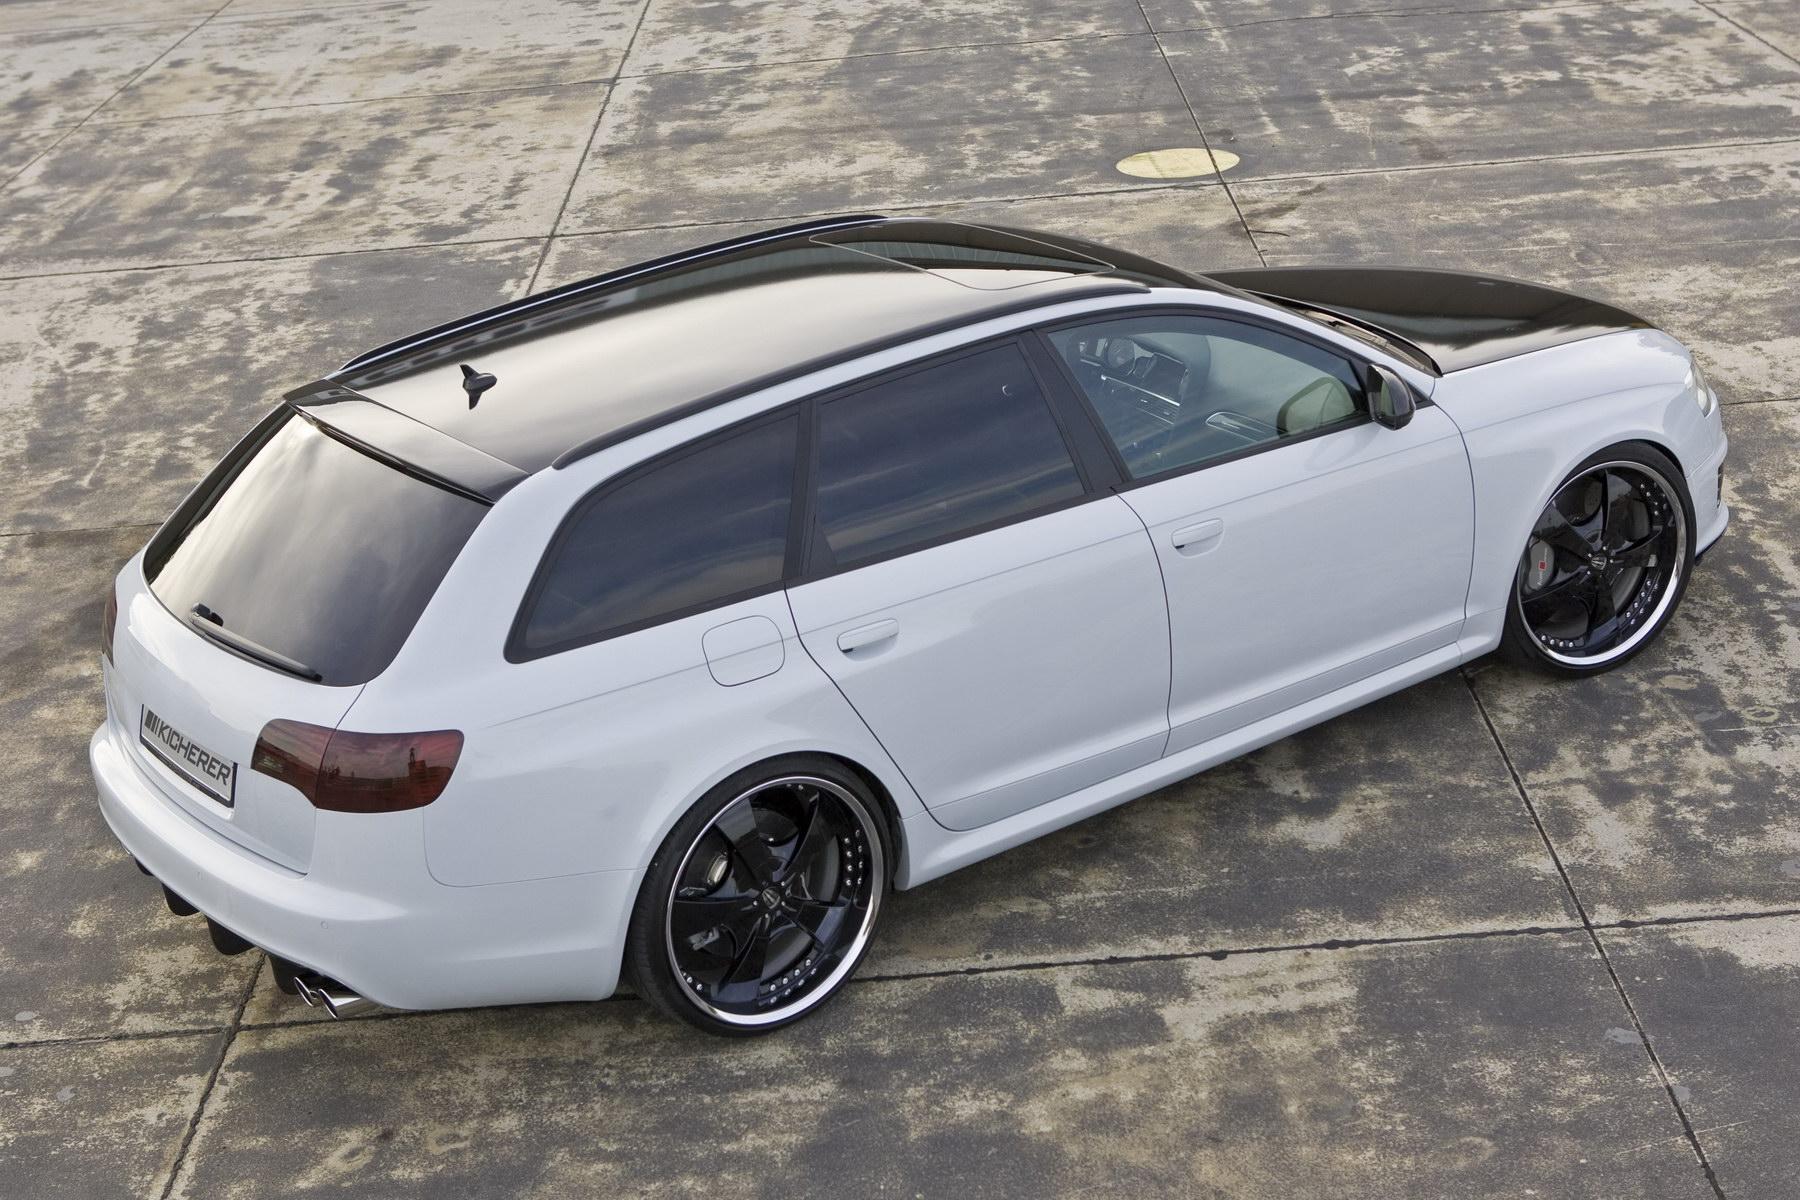 Kicherer Audi Rs6 Avant Photos Photogallery With 7 Pics